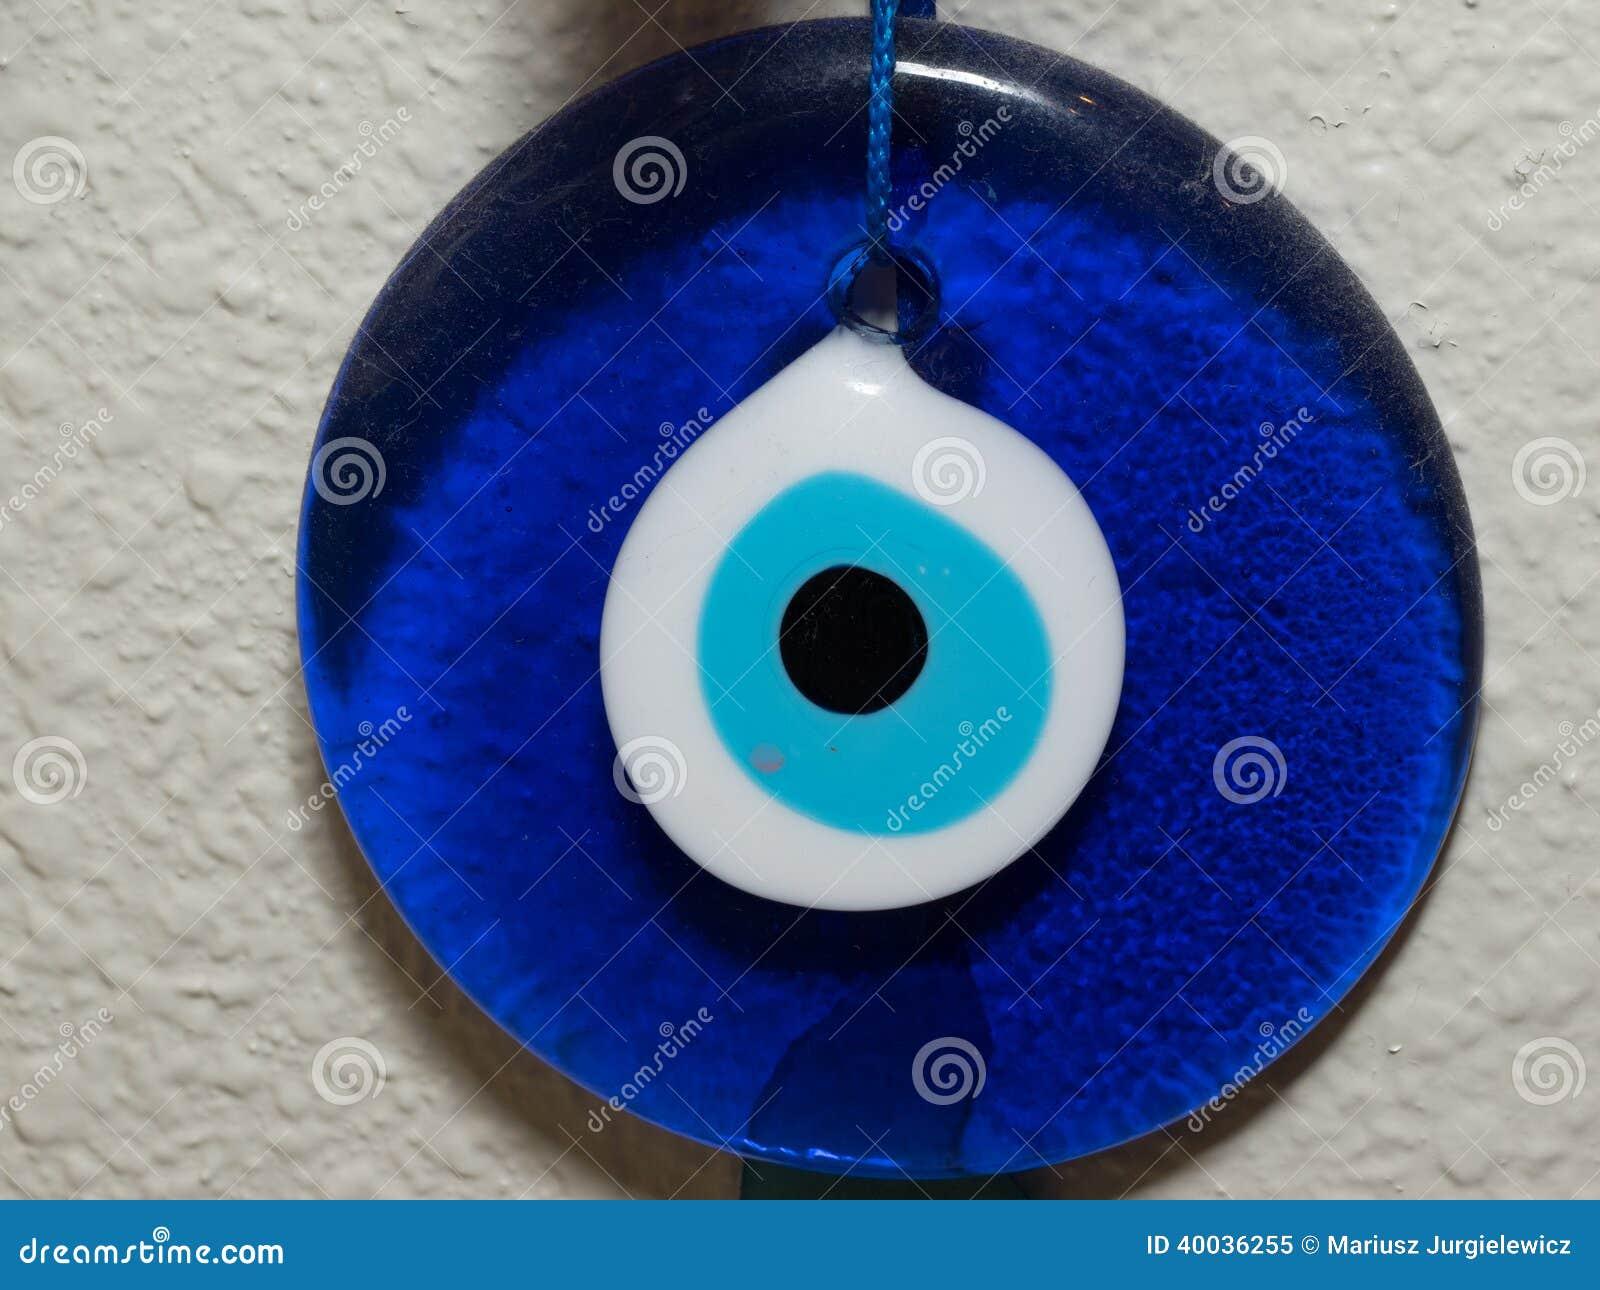 Evil eye stock image image of protect traditional arabic 40036255 evil eye biocorpaavc